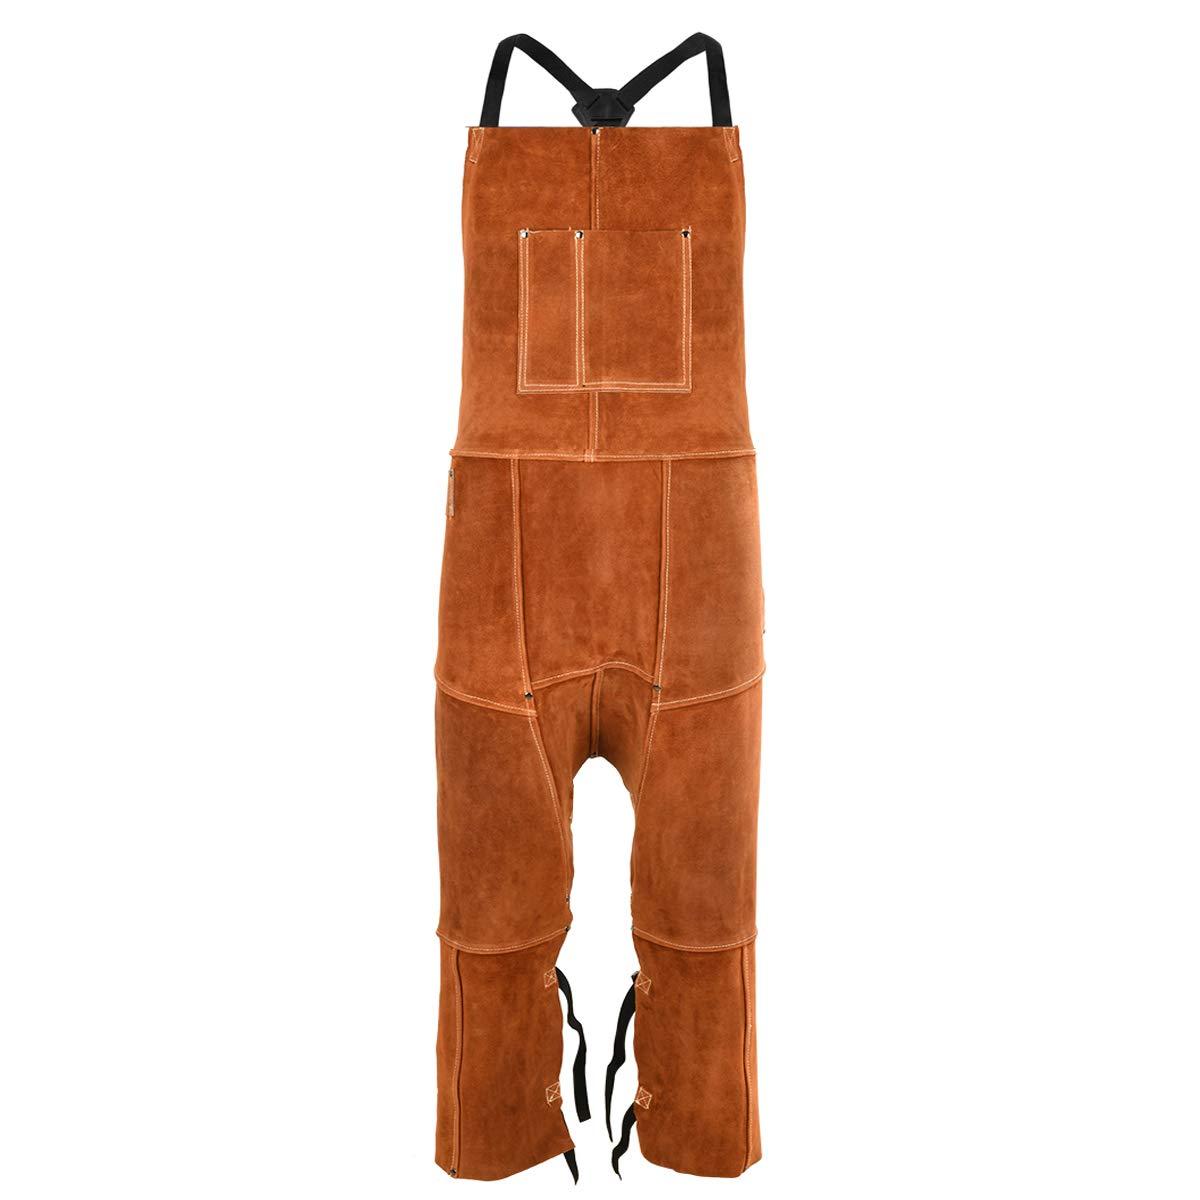 Leather Welding Apron Split Leg for Men - Spark   Flame   Heat Resistant Bib Apron by QeeLink - Heavy Duty Cowhide Leather - 24 x 42-inch, One Size Fit Most